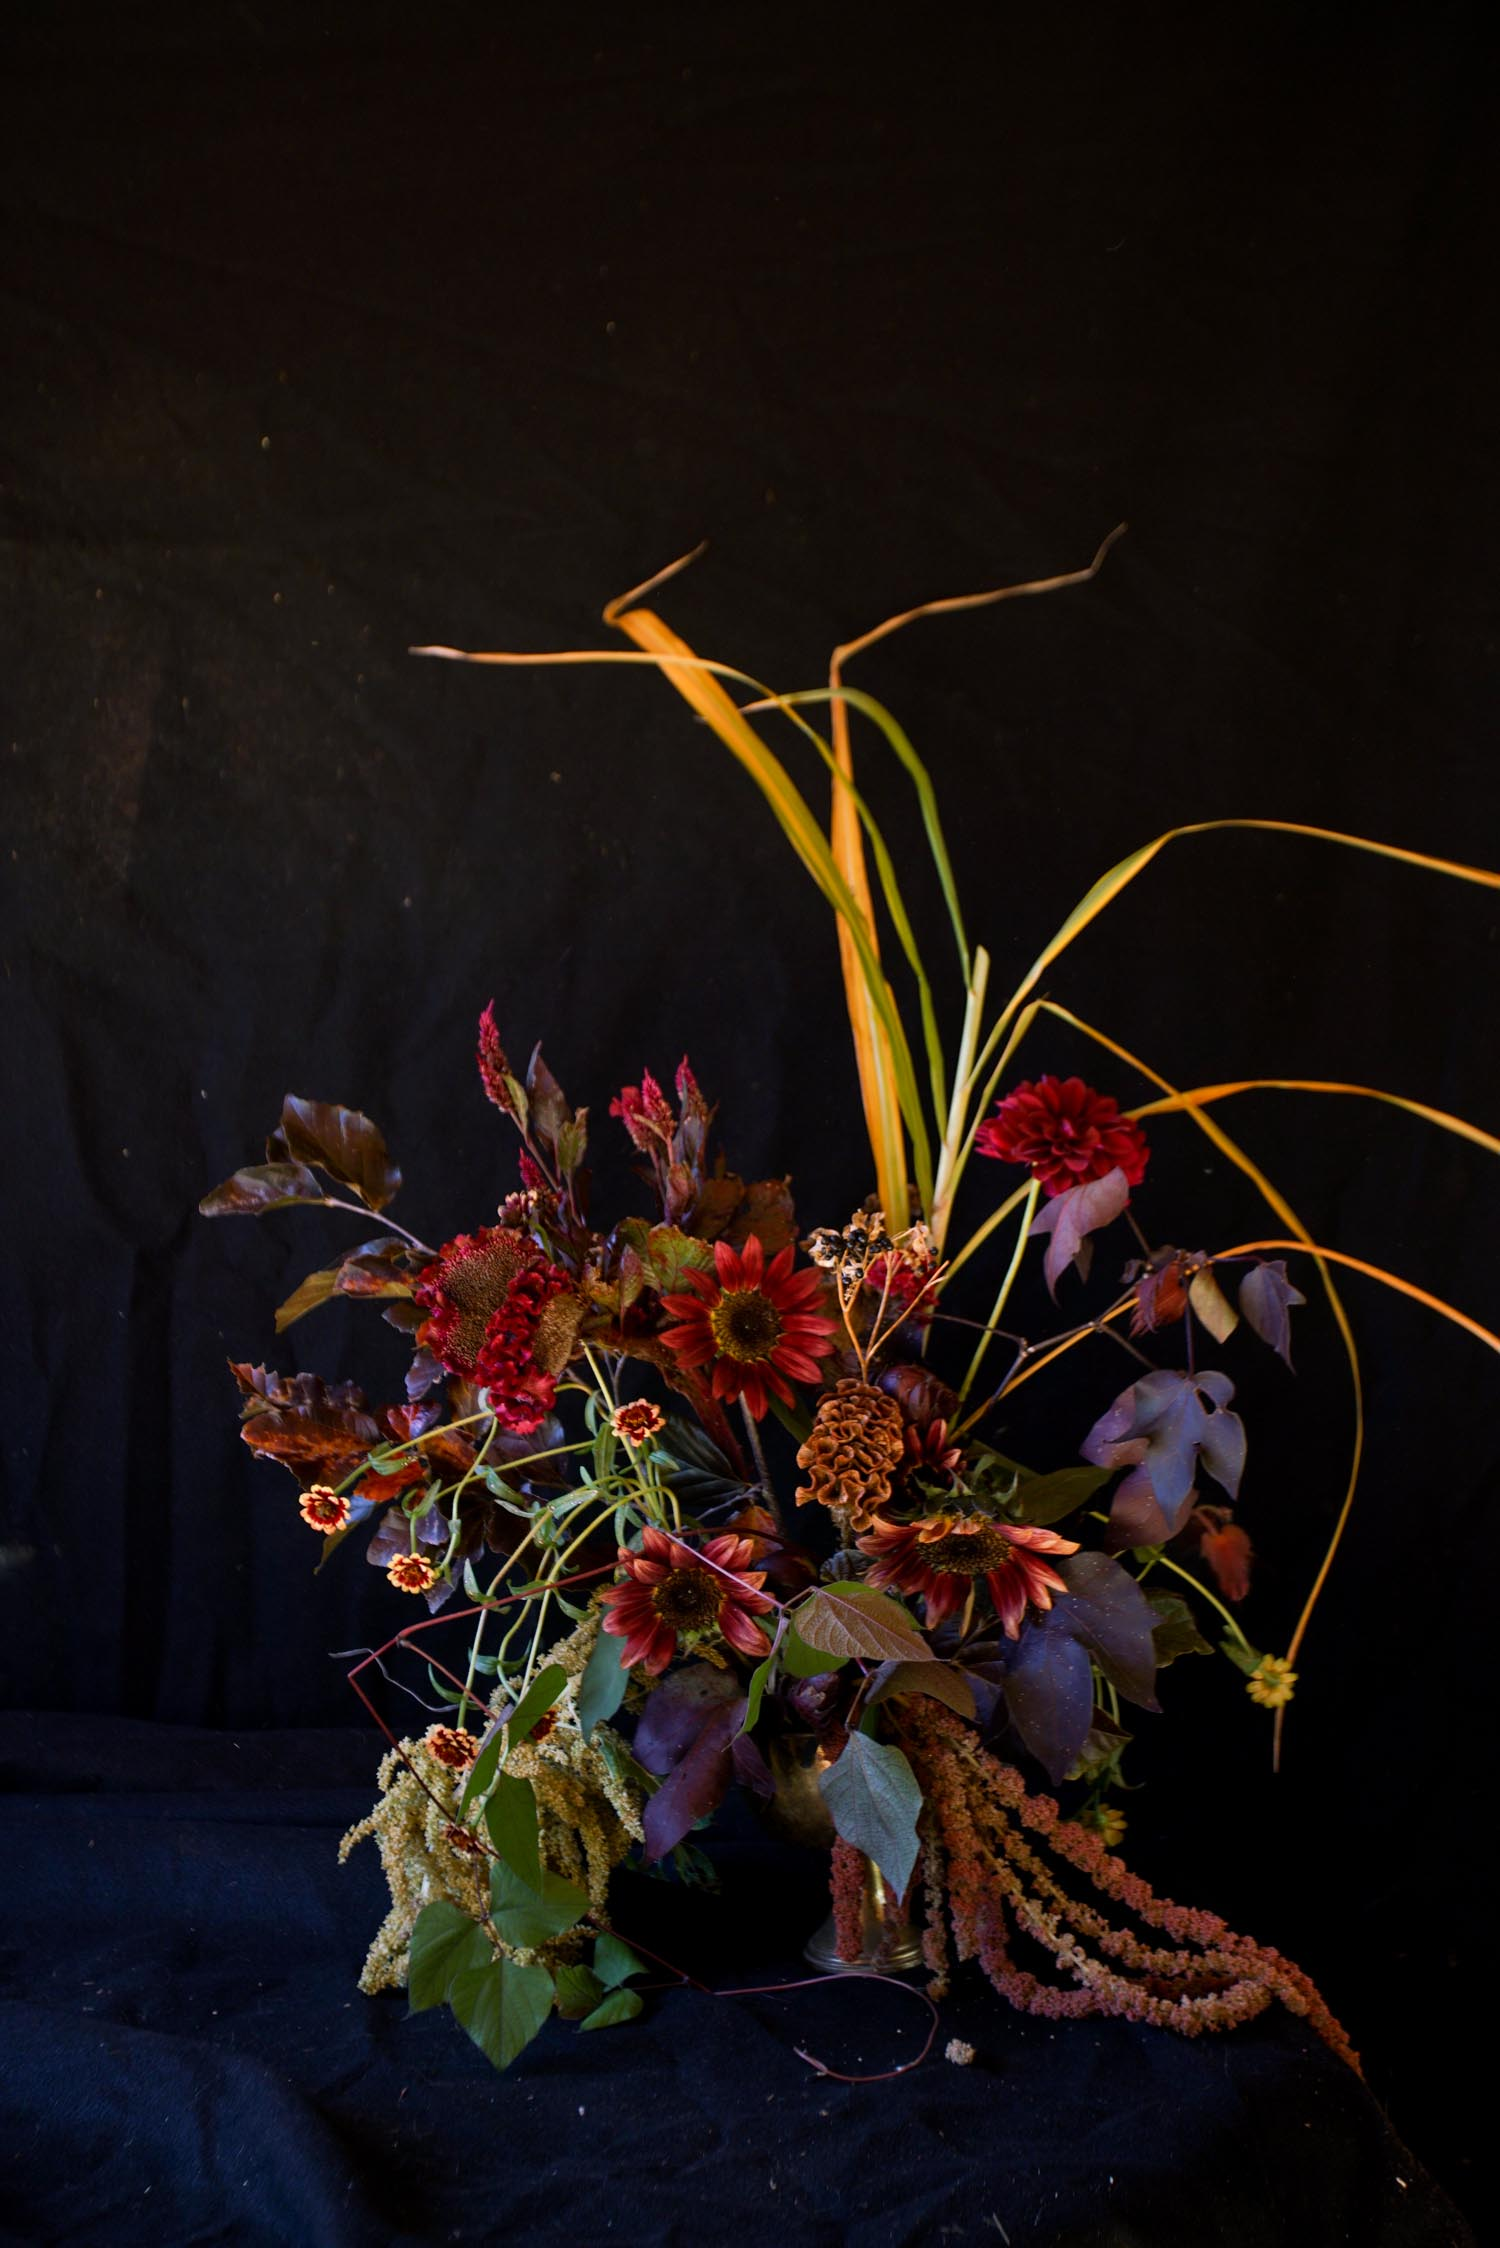 RA_3 porch farm 2016 flower social-2016101709011.jpg